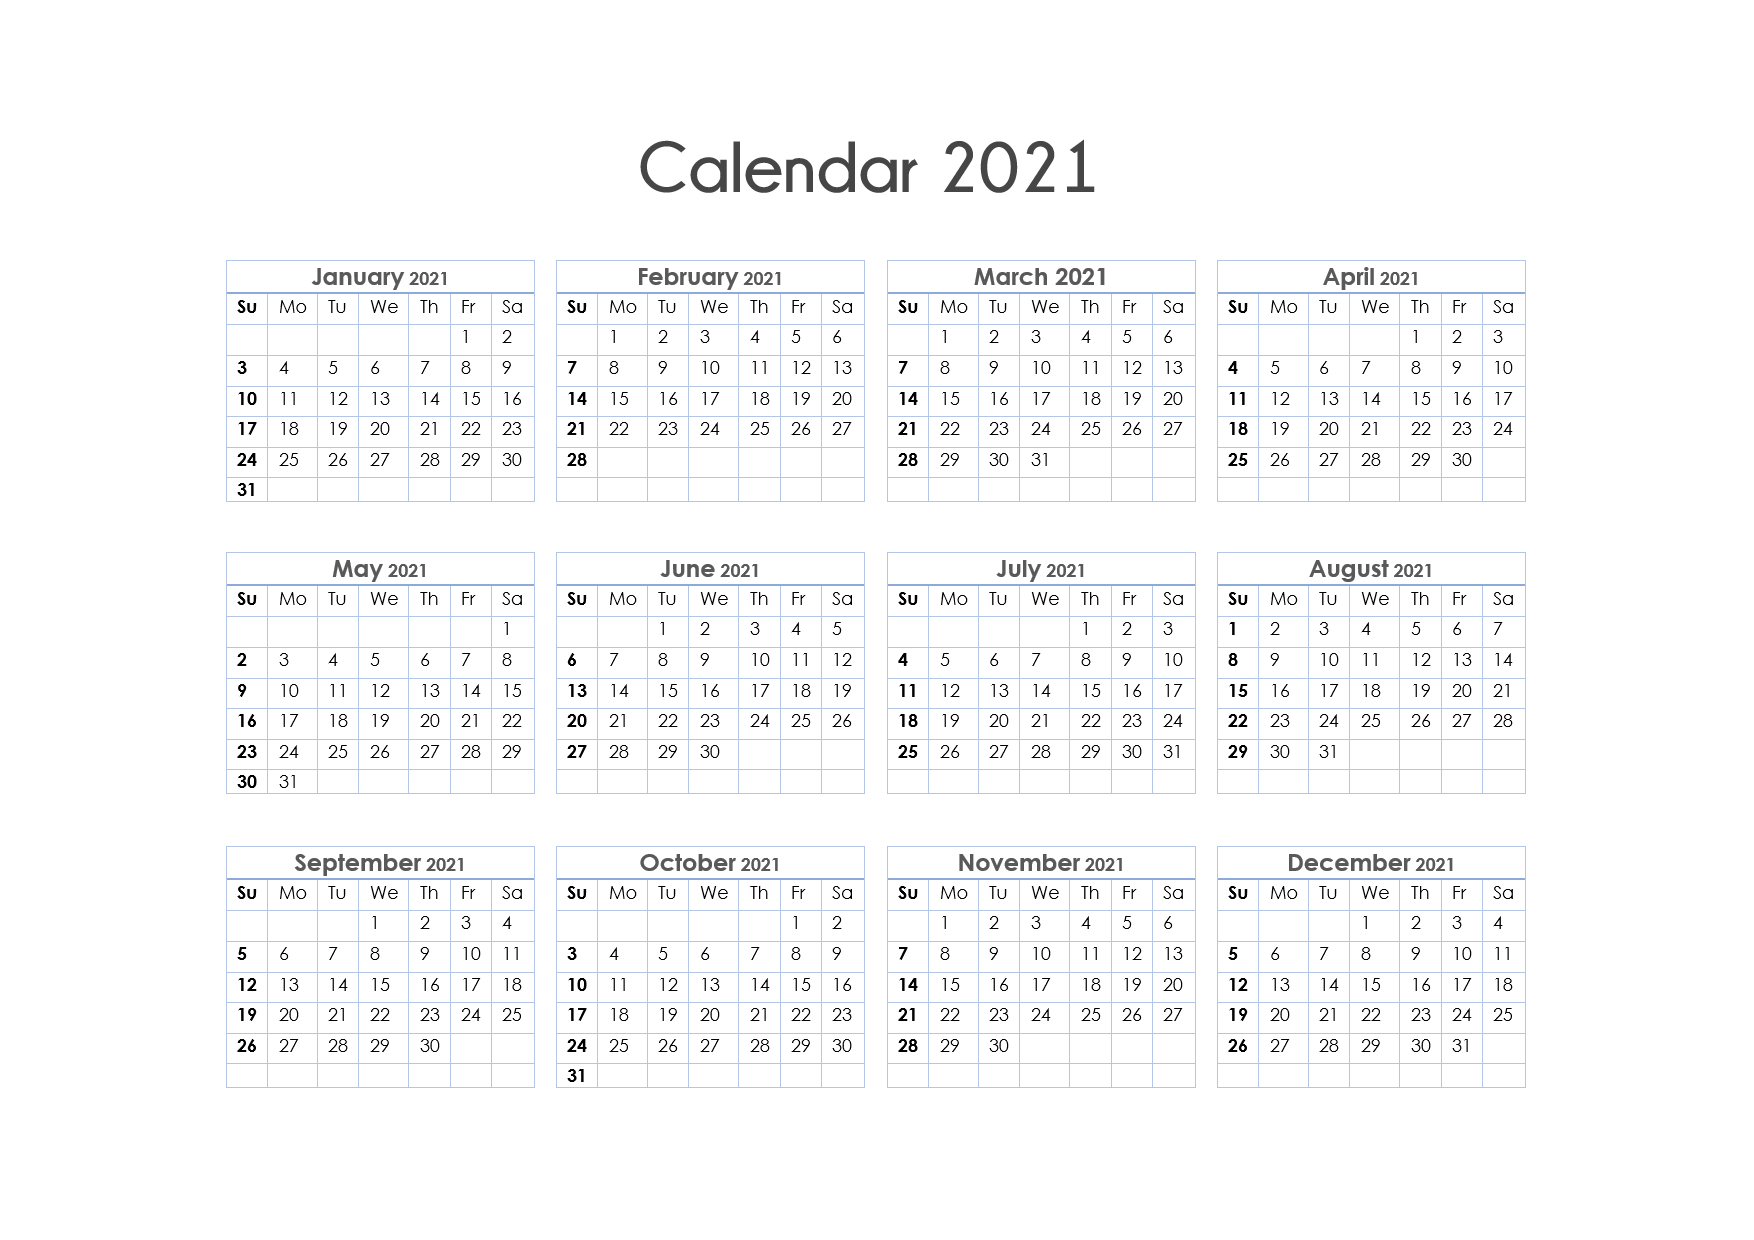 56+ Printable Calendar 2021 One Page, Us 2021 Calendar with Pocket Calendar 2021-2021: Two Year